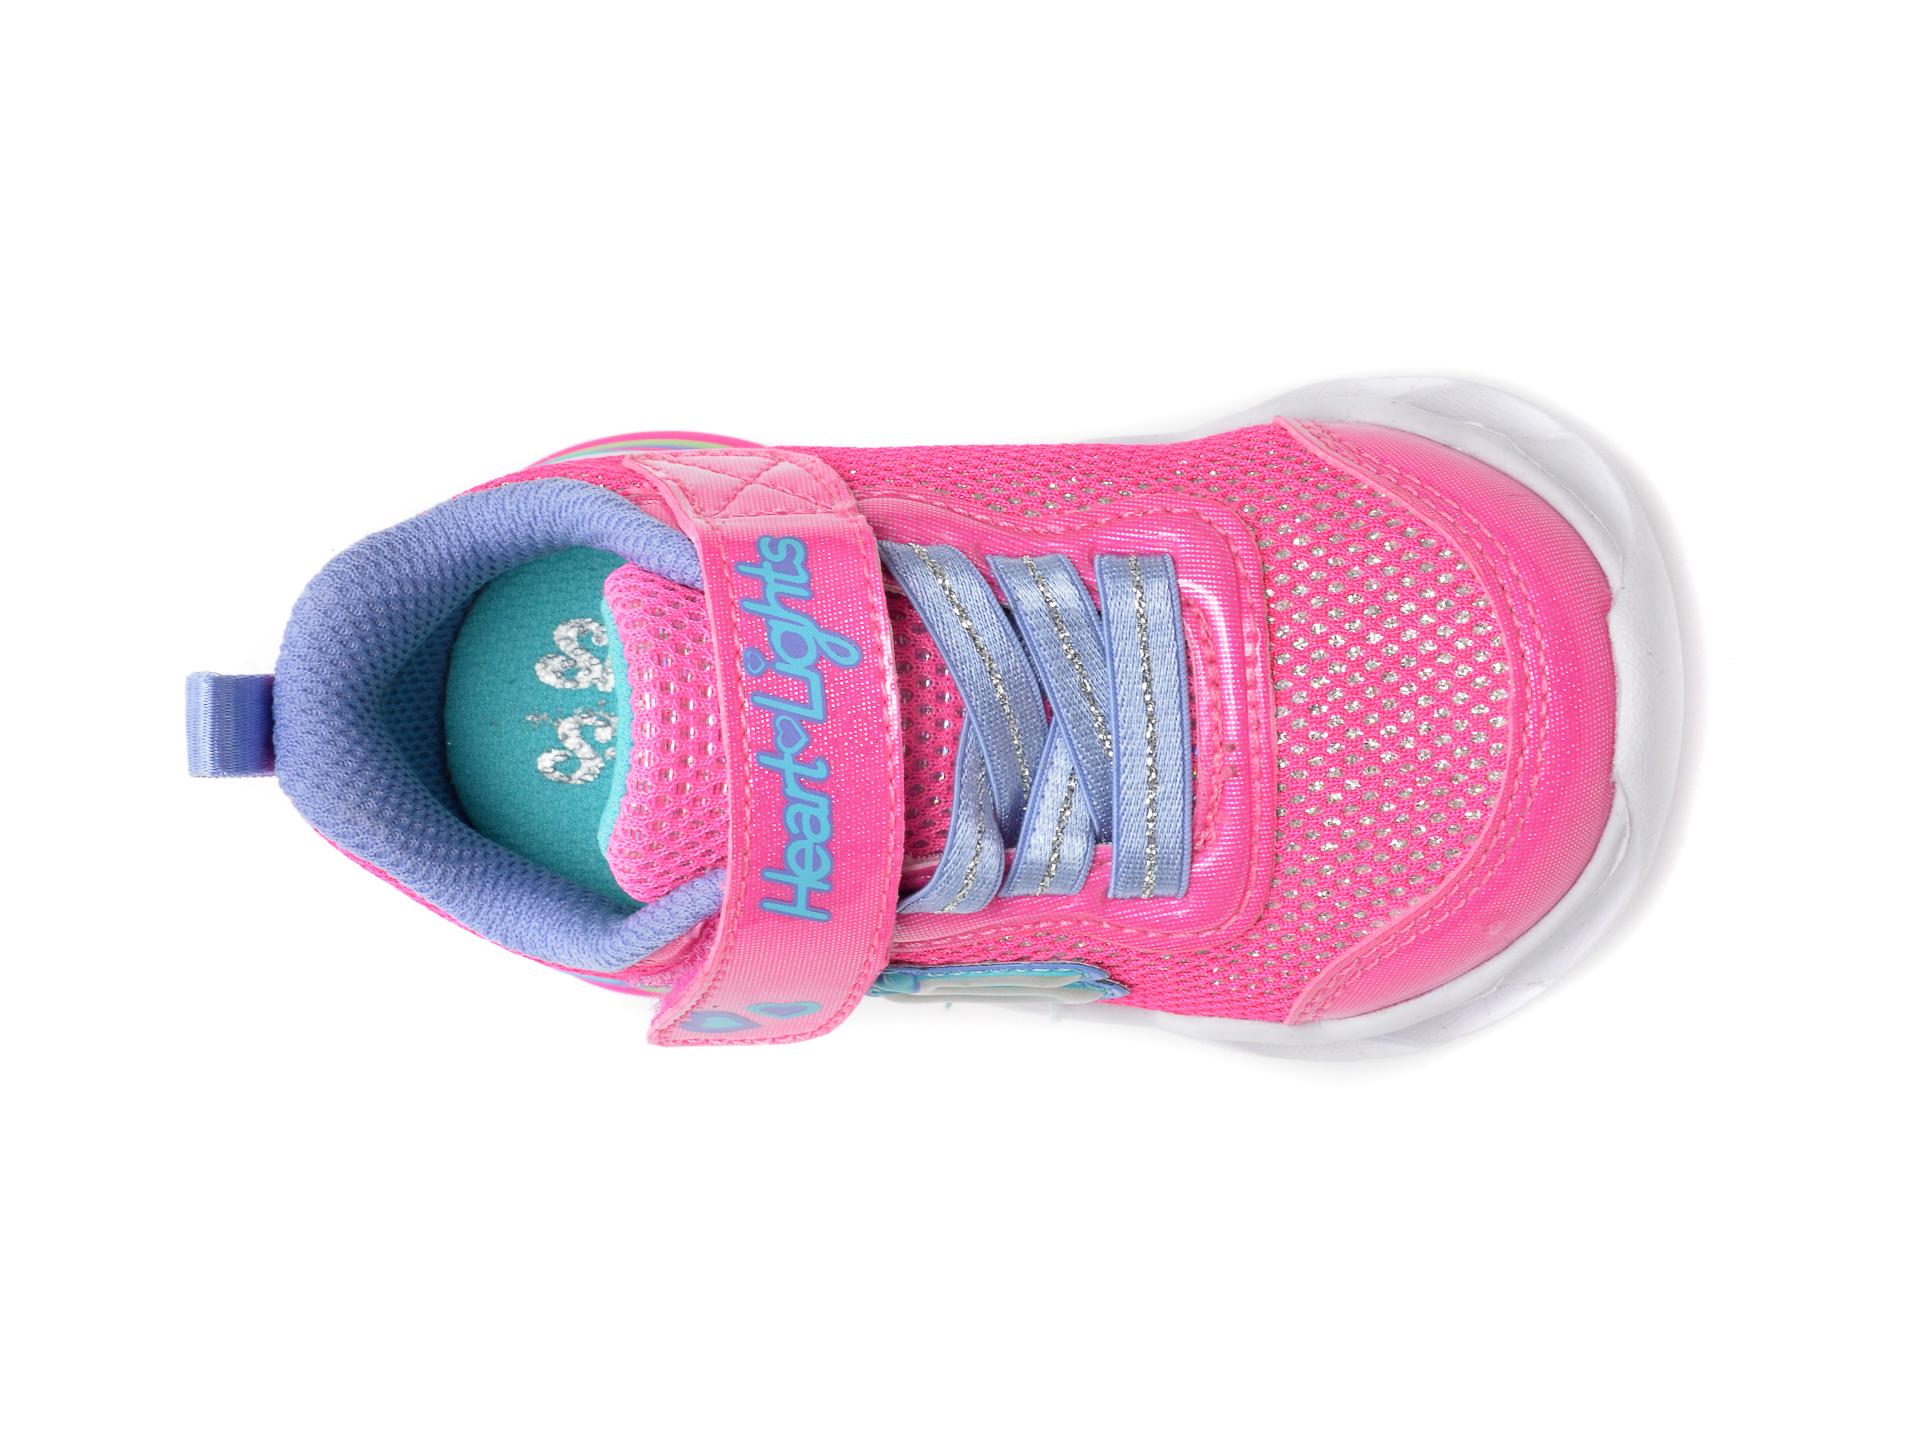 Pantofi sport SKECHERS roz, Sweetheart Lights Shimmer Spells, din piele ecologica - 6